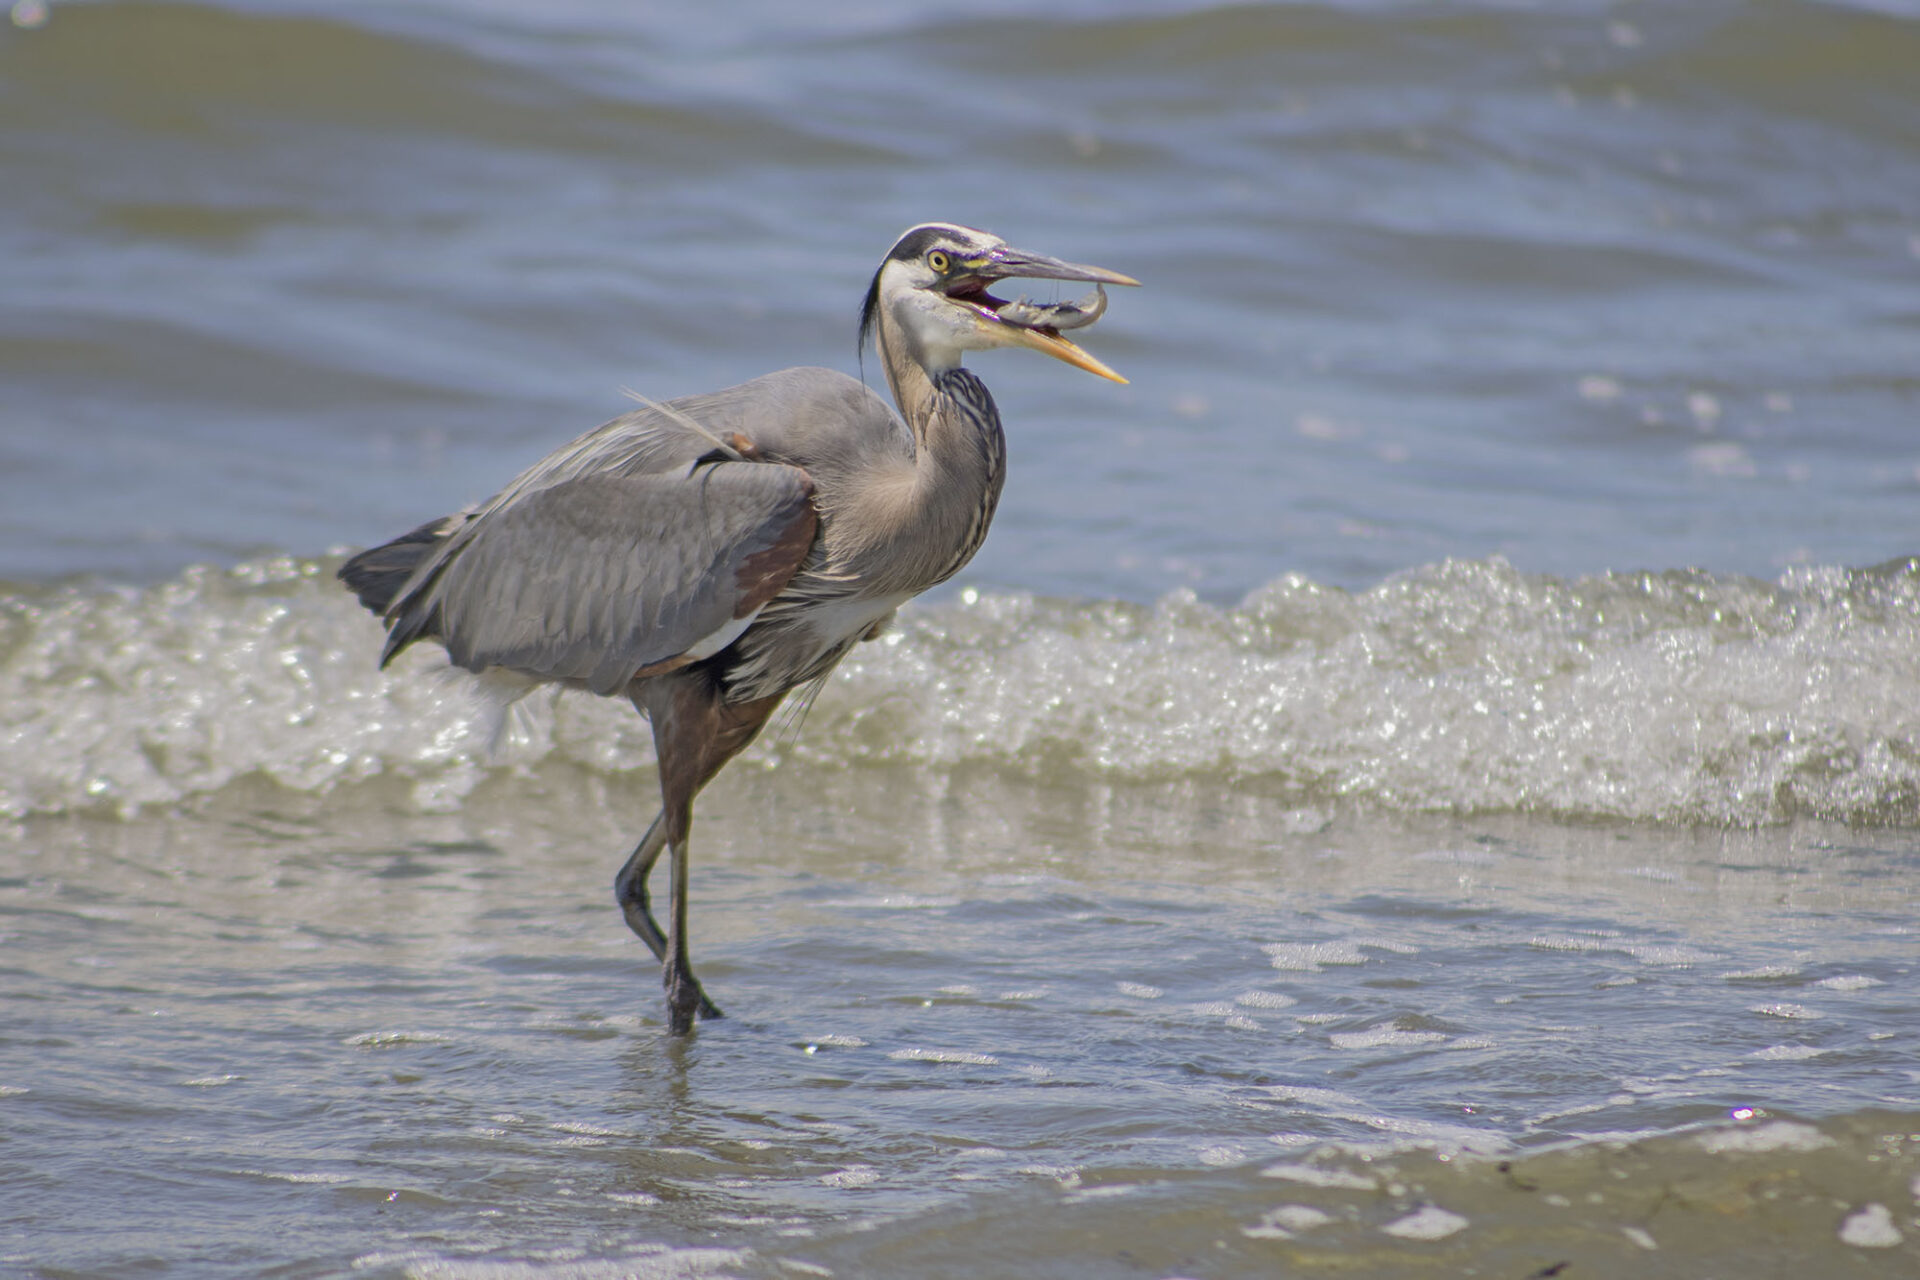 Great Blue Heron, July 19, 2021